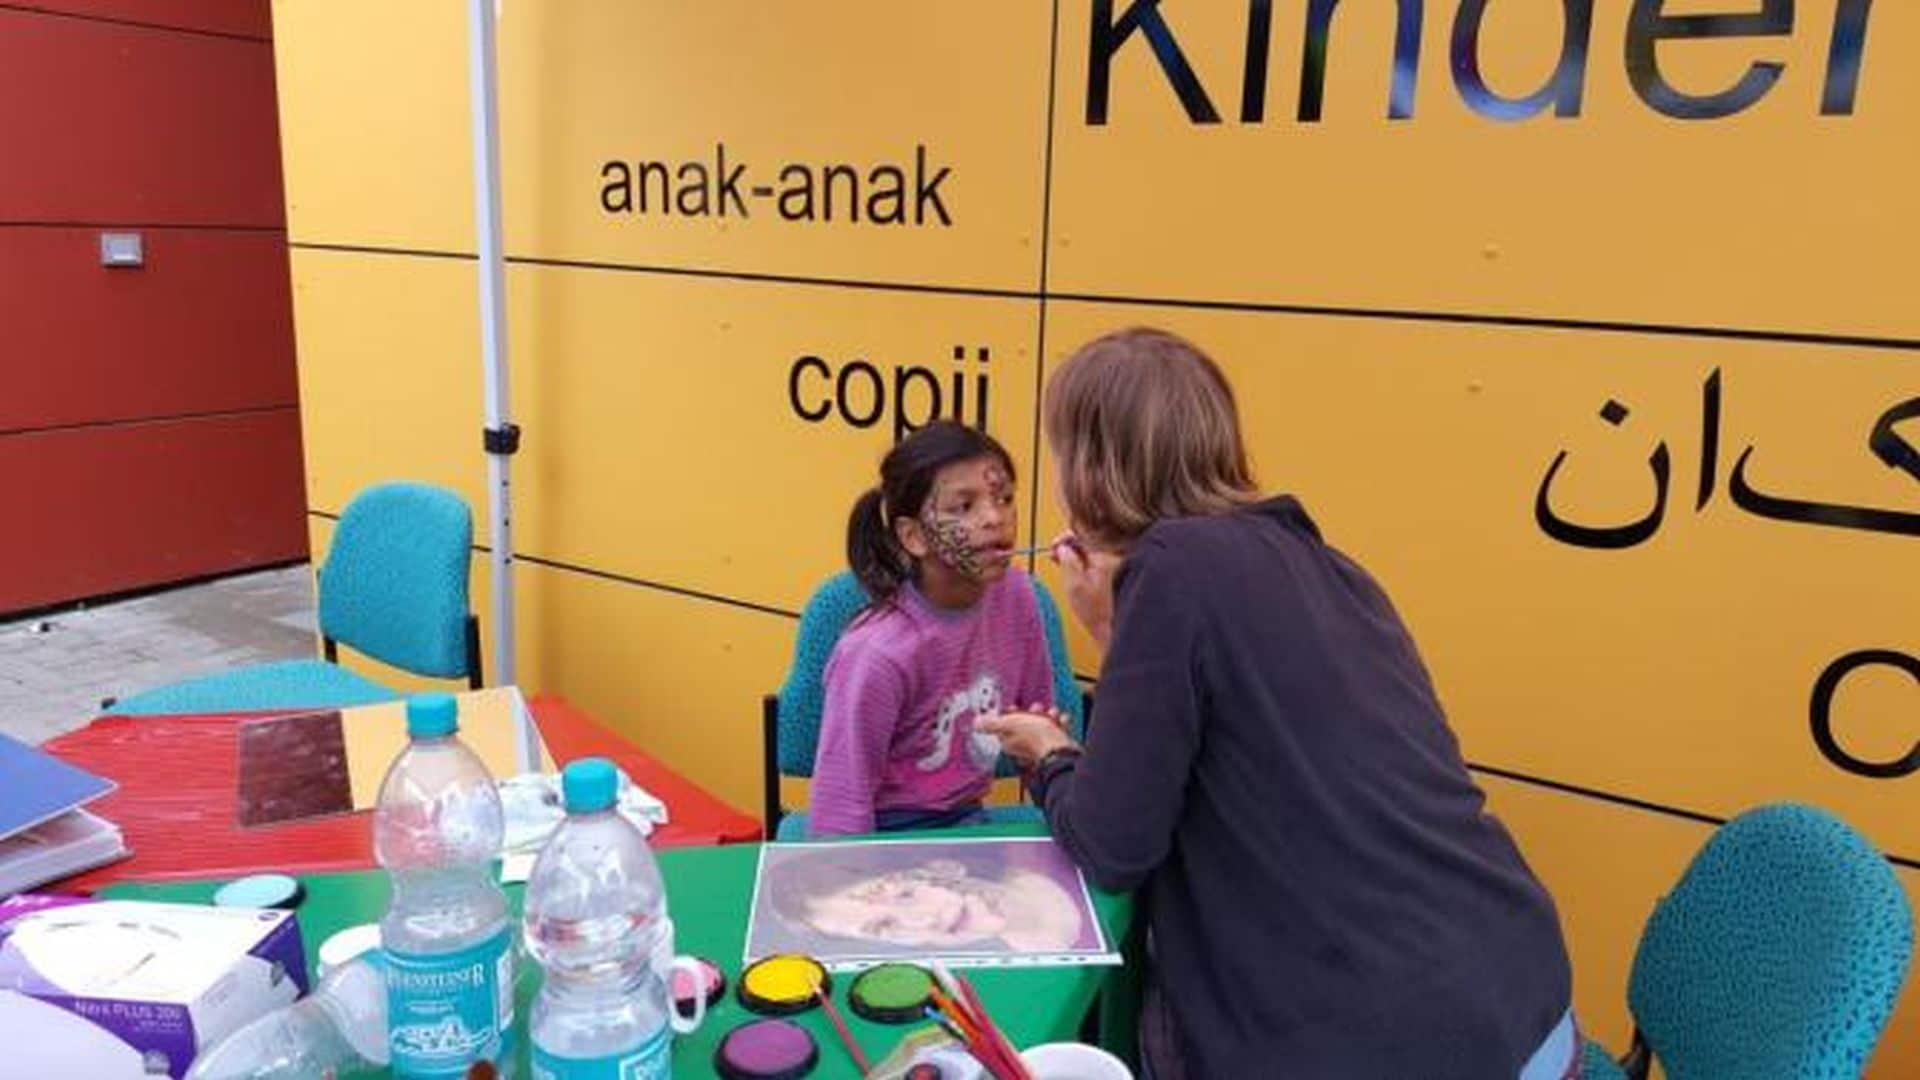 Aktuelles aus der Flüchtlingskita in Osnabrück